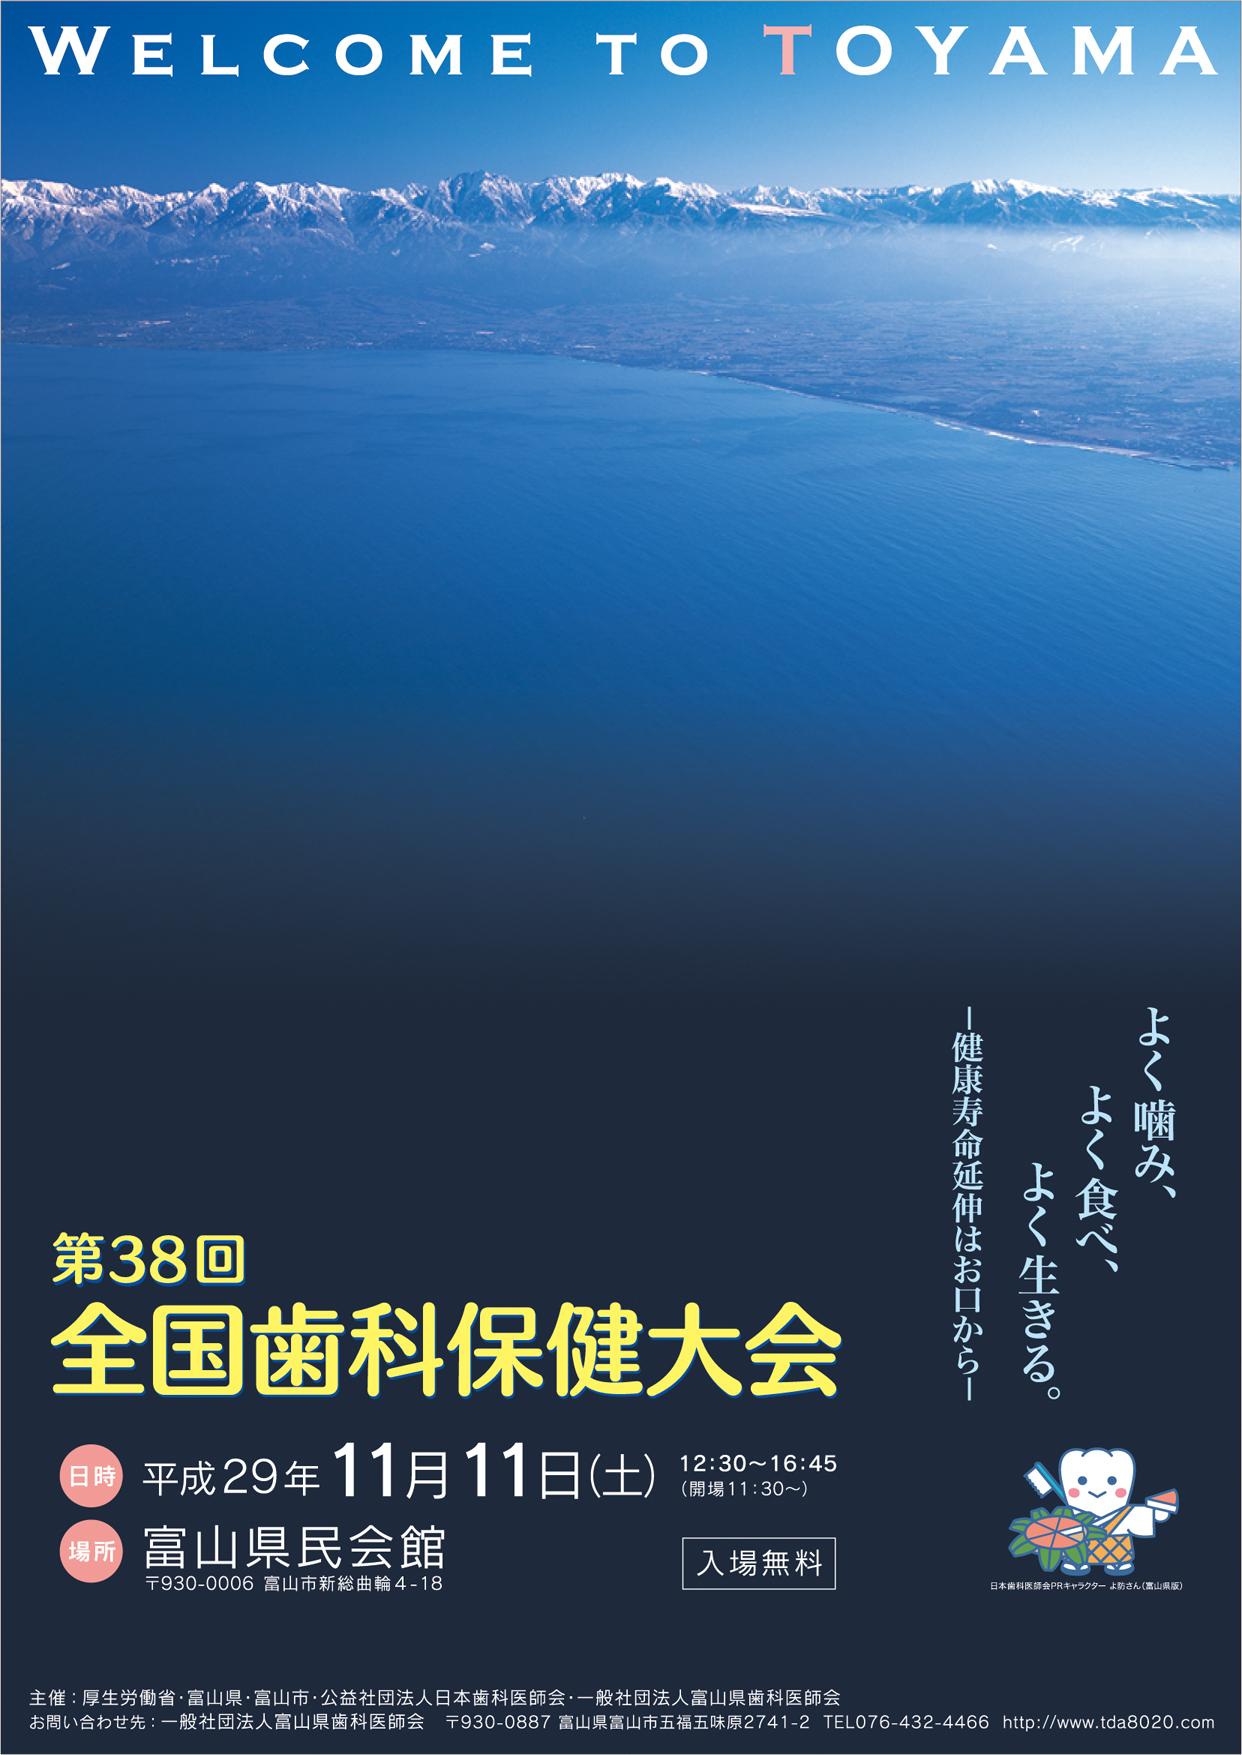 http://www.tda8020.com/news/5_a4_.jpg